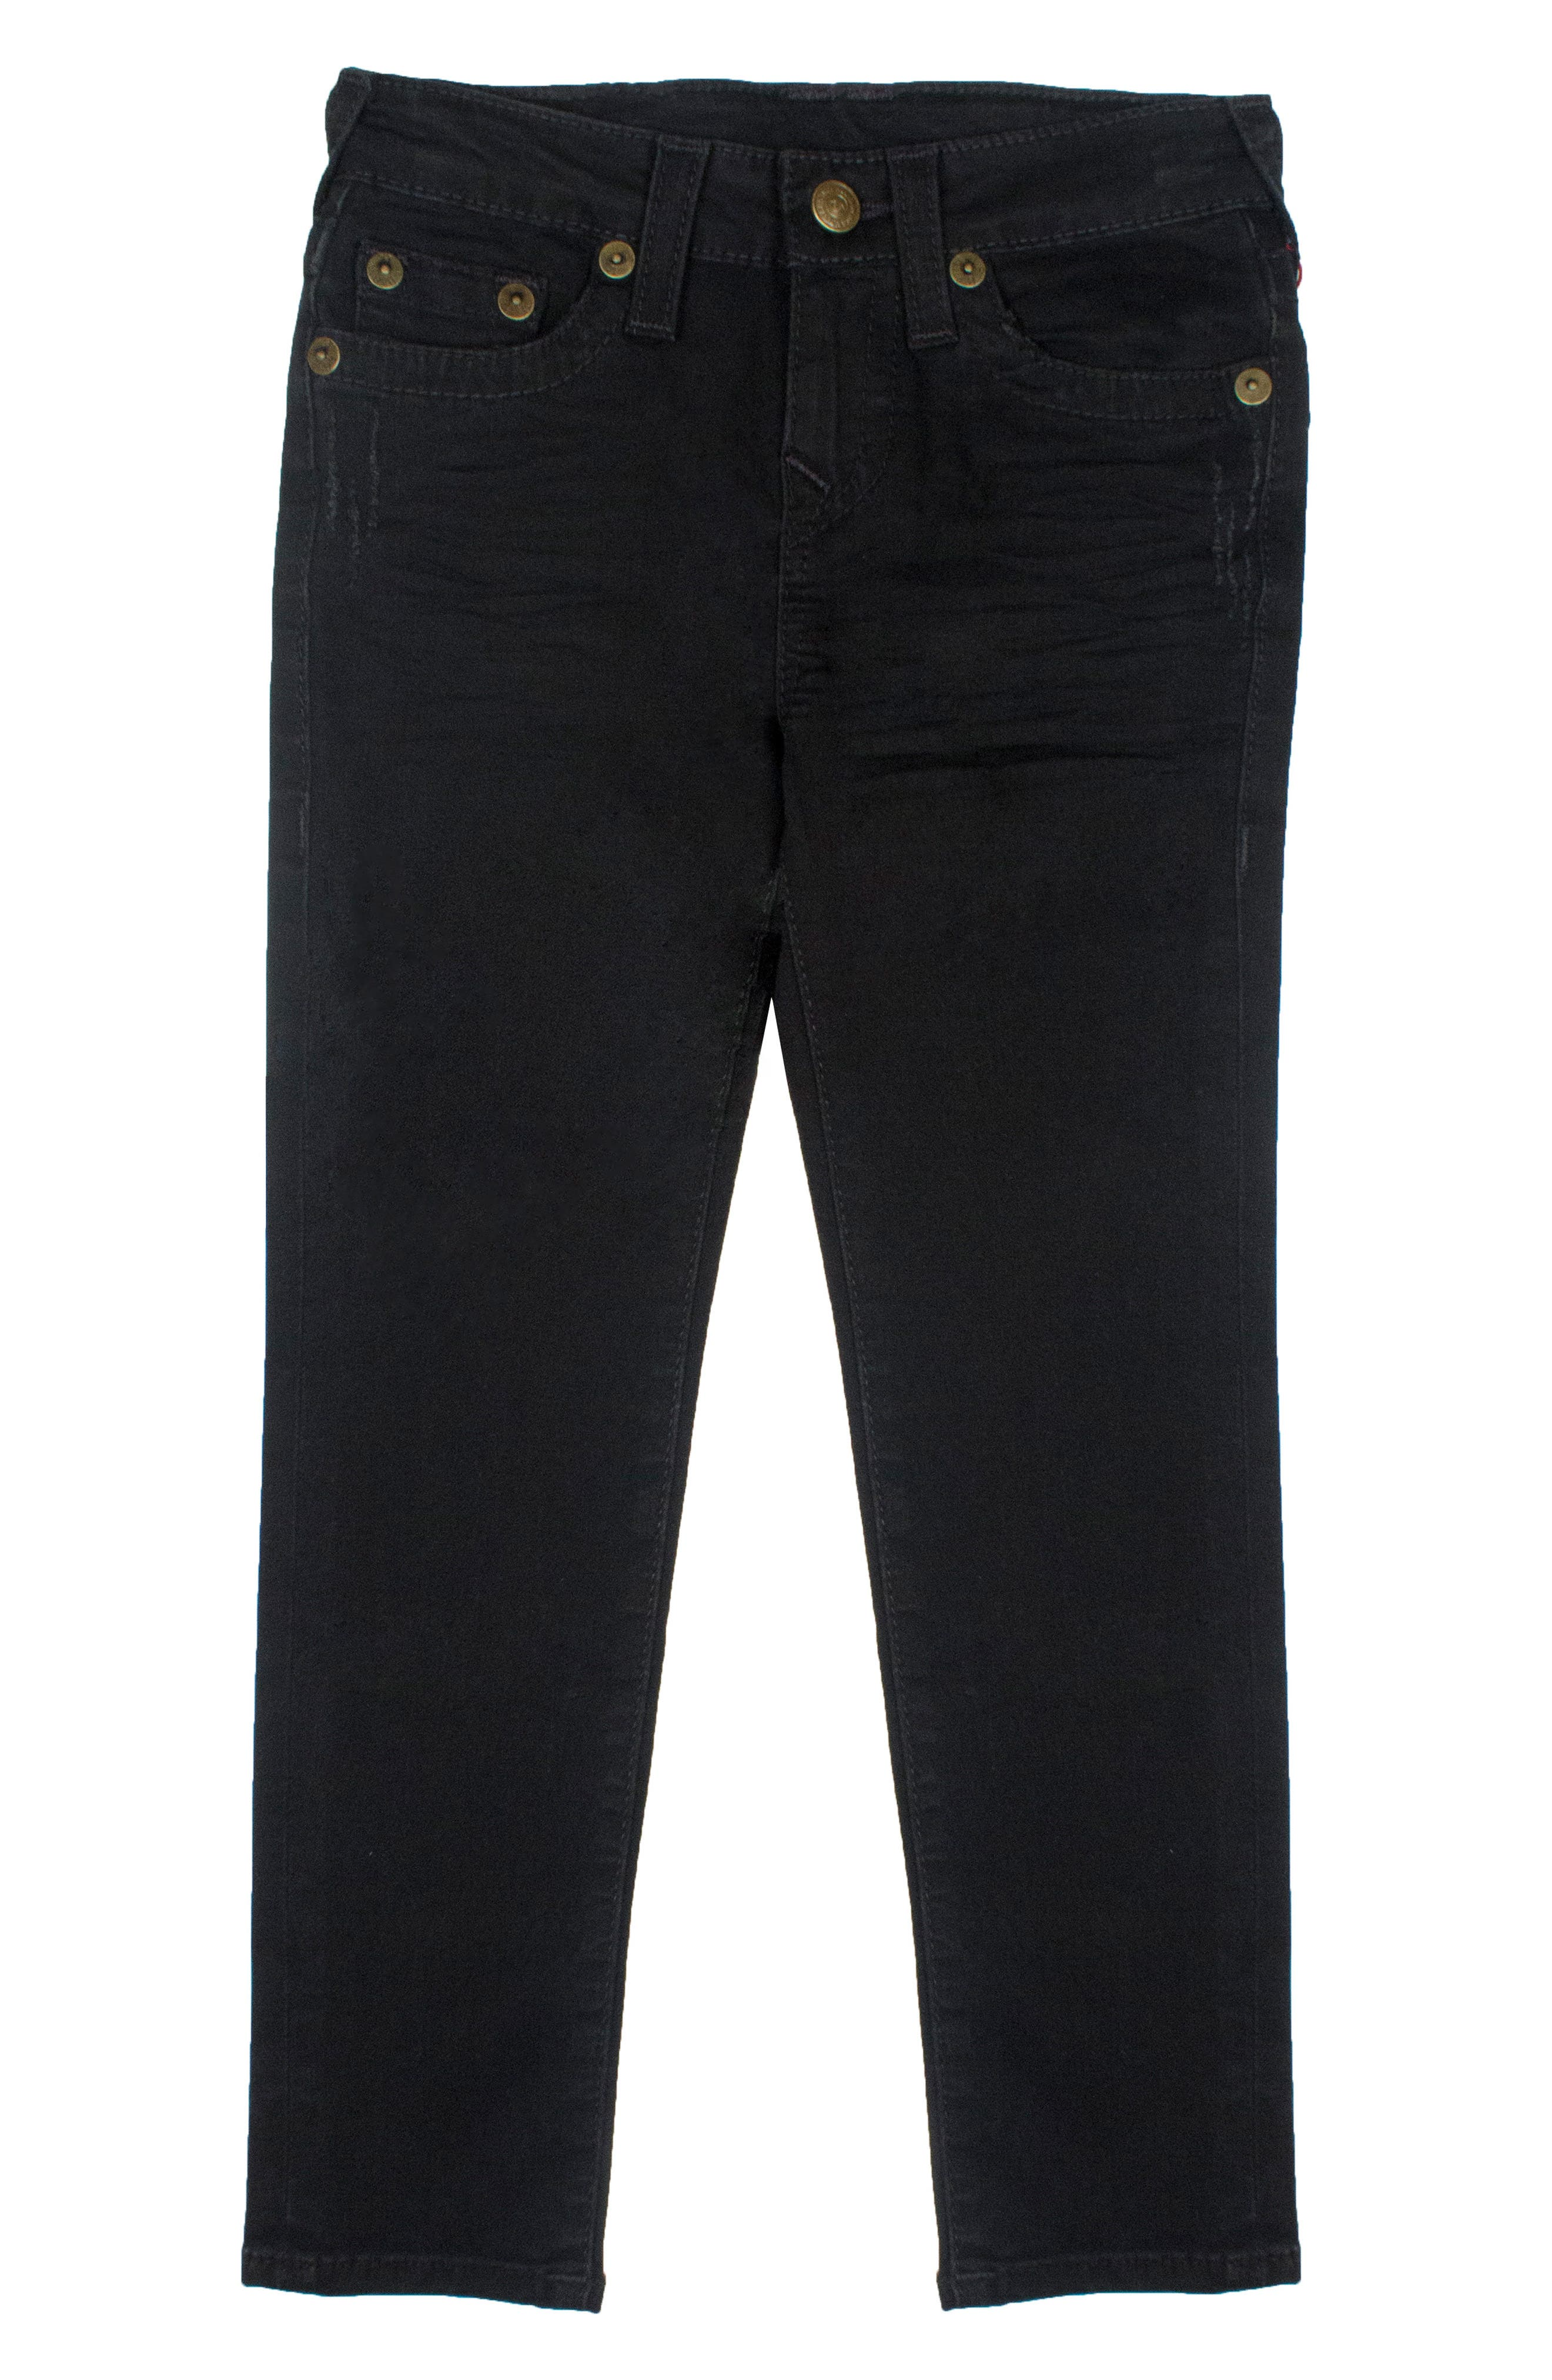 Main Image - True Religion Brand Jeans Geno Single End Jeans (Toddler Boys & Little Boys)